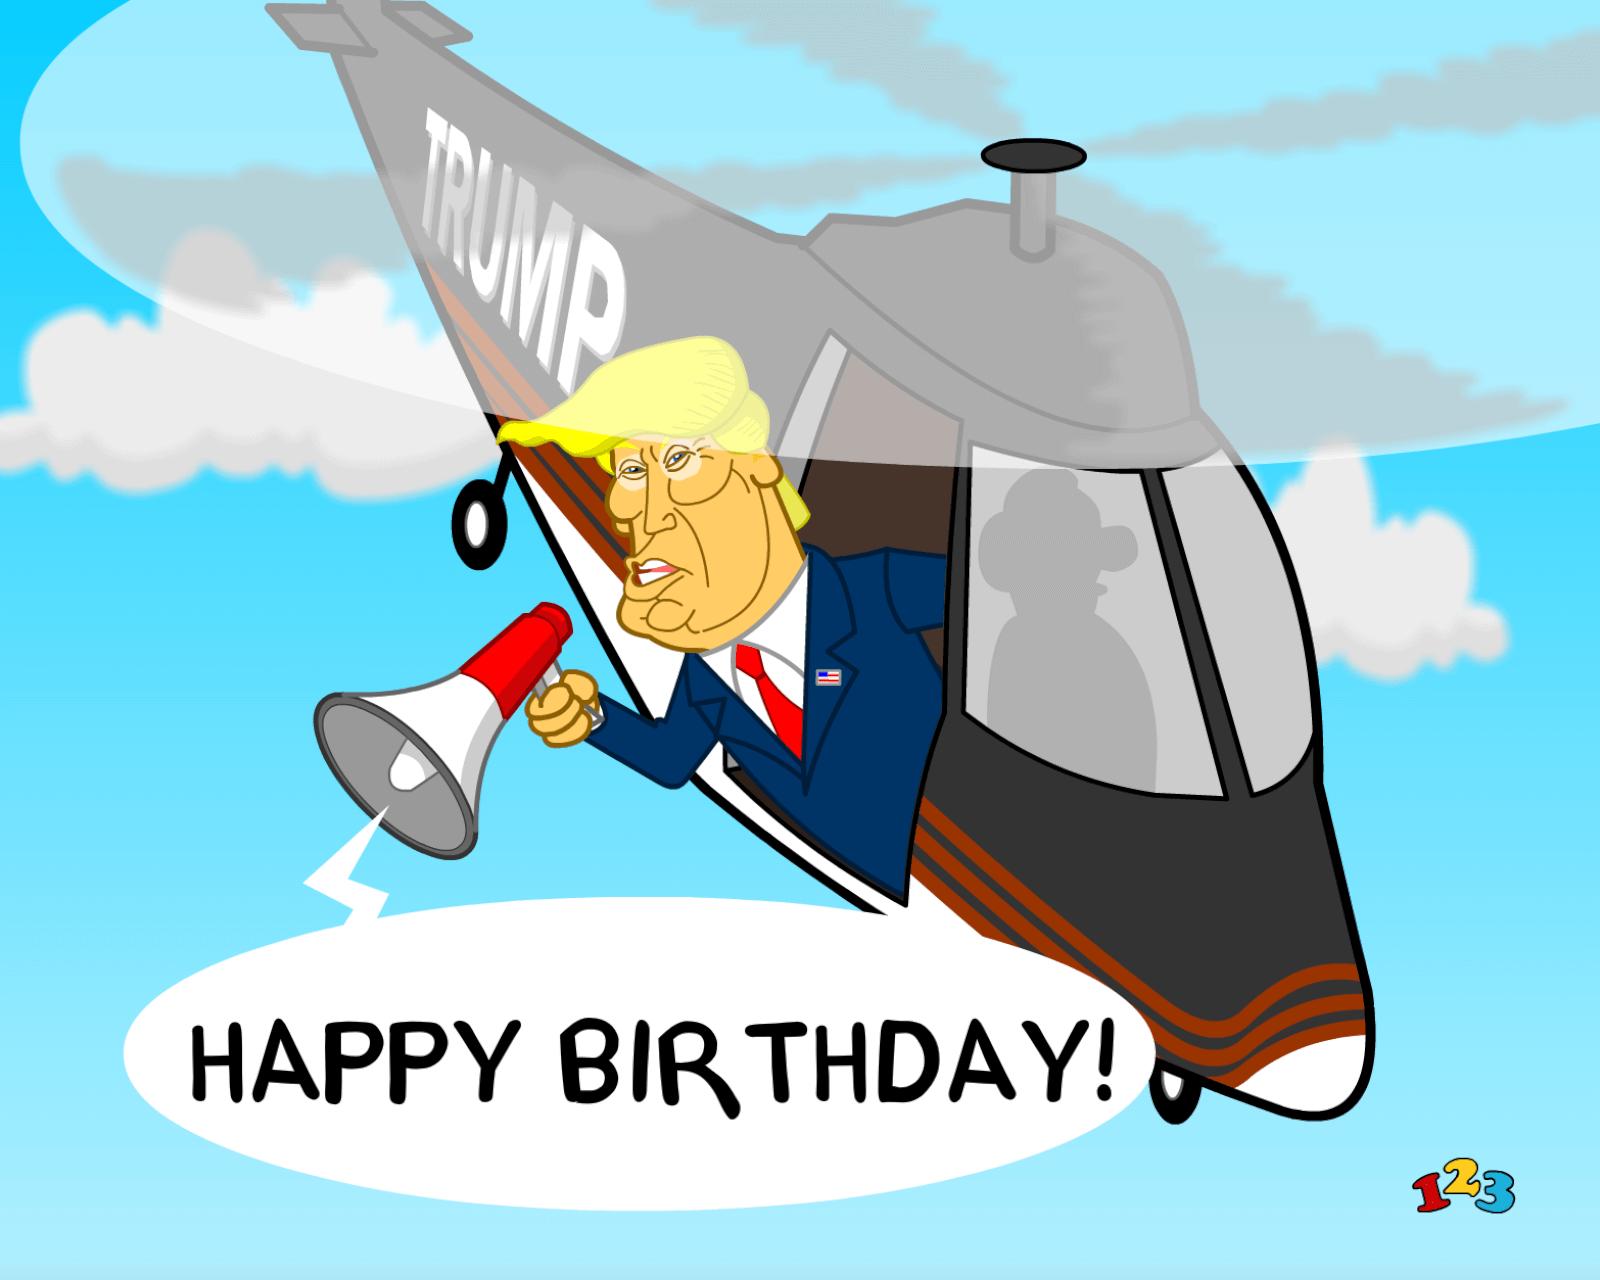 Trump Birthday Birthday Send Free Ecards From 123cards Com